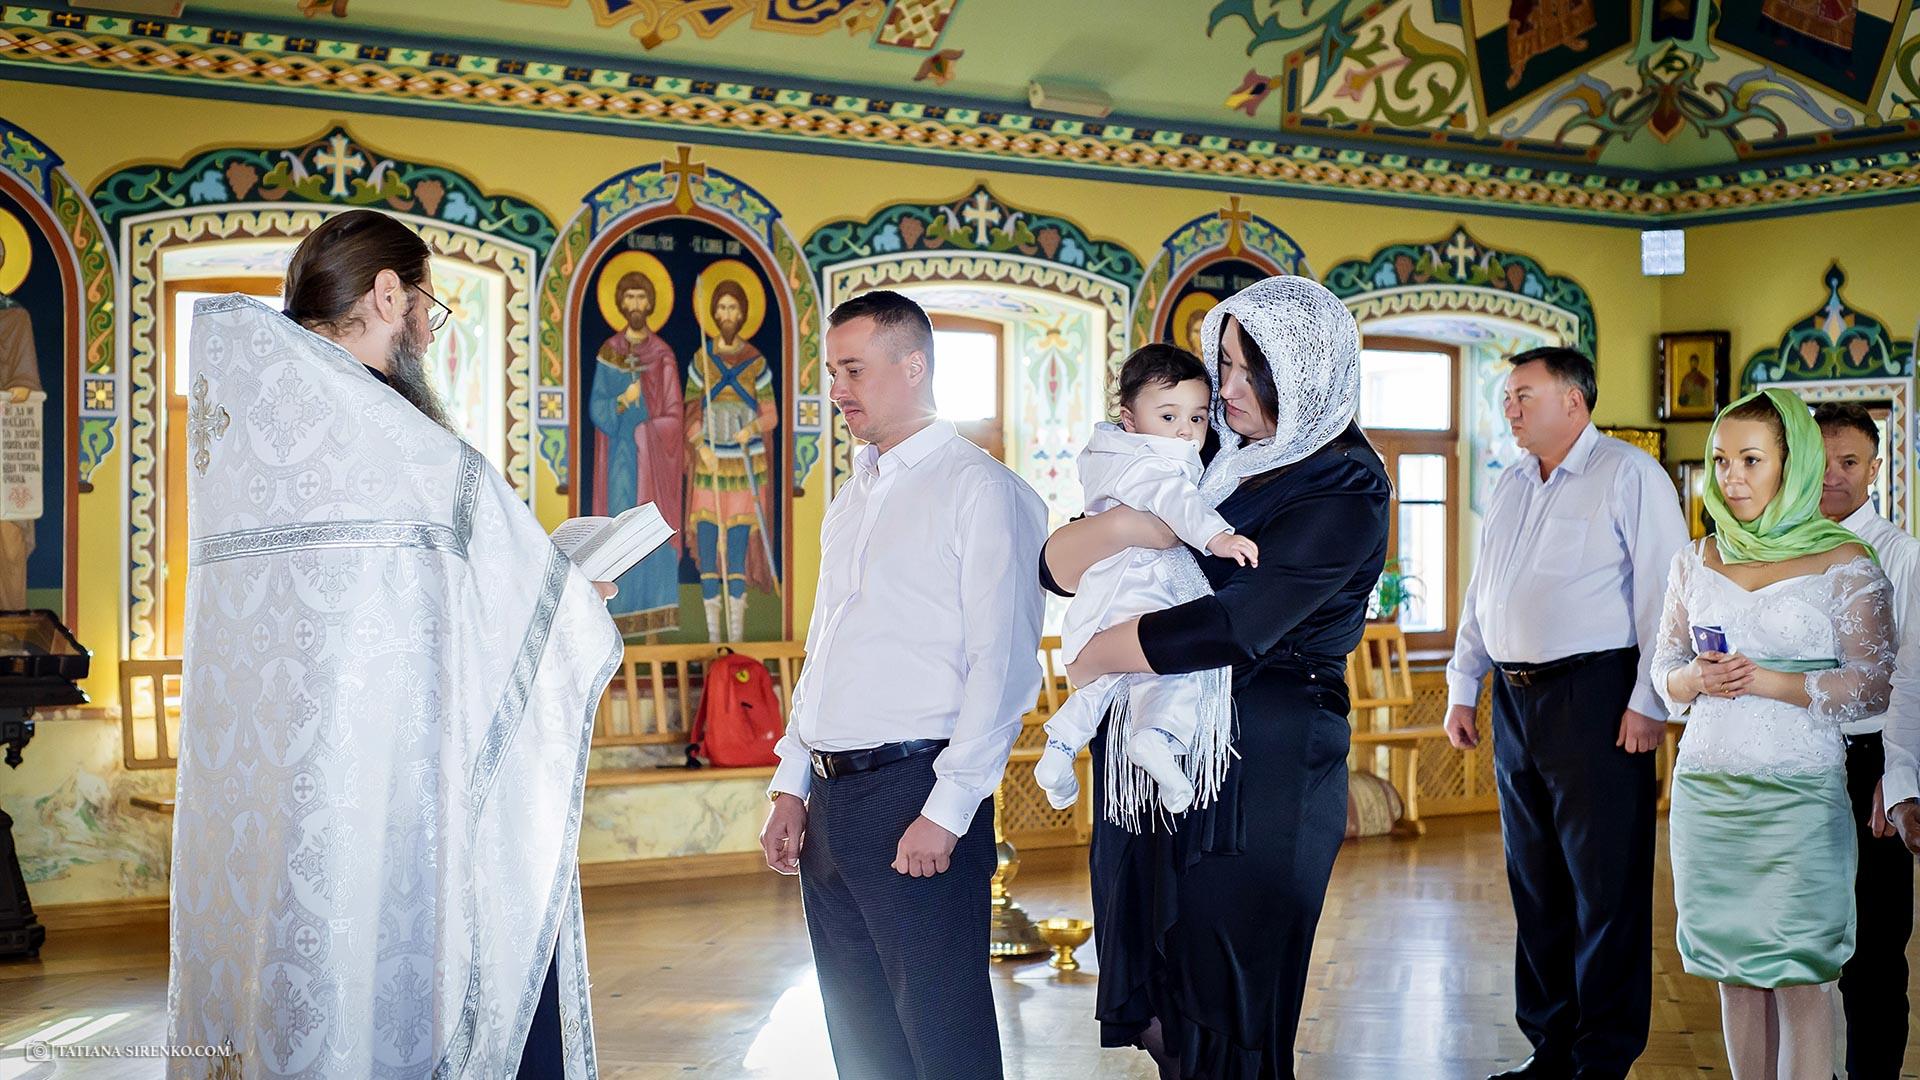 Фотосъемка крещения в Киеве